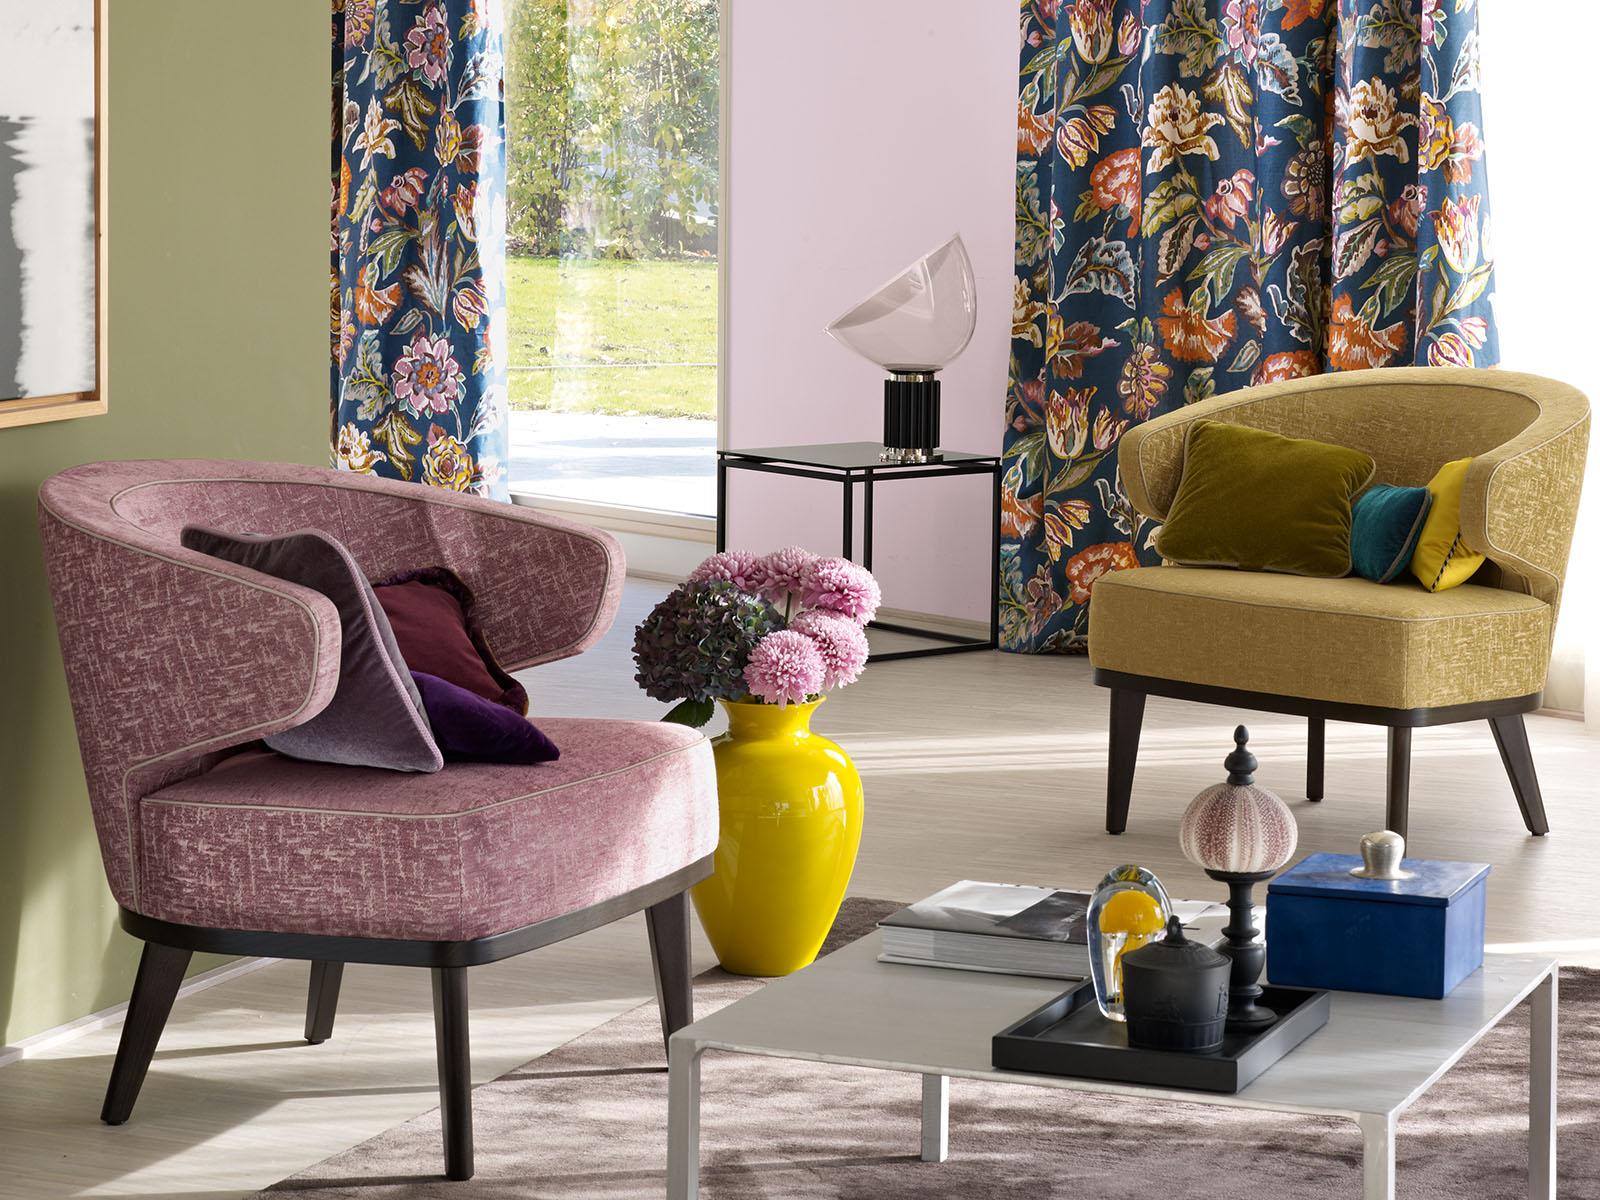 zimmer rohde gmbh tophotelsupplier. Black Bedroom Furniture Sets. Home Design Ideas